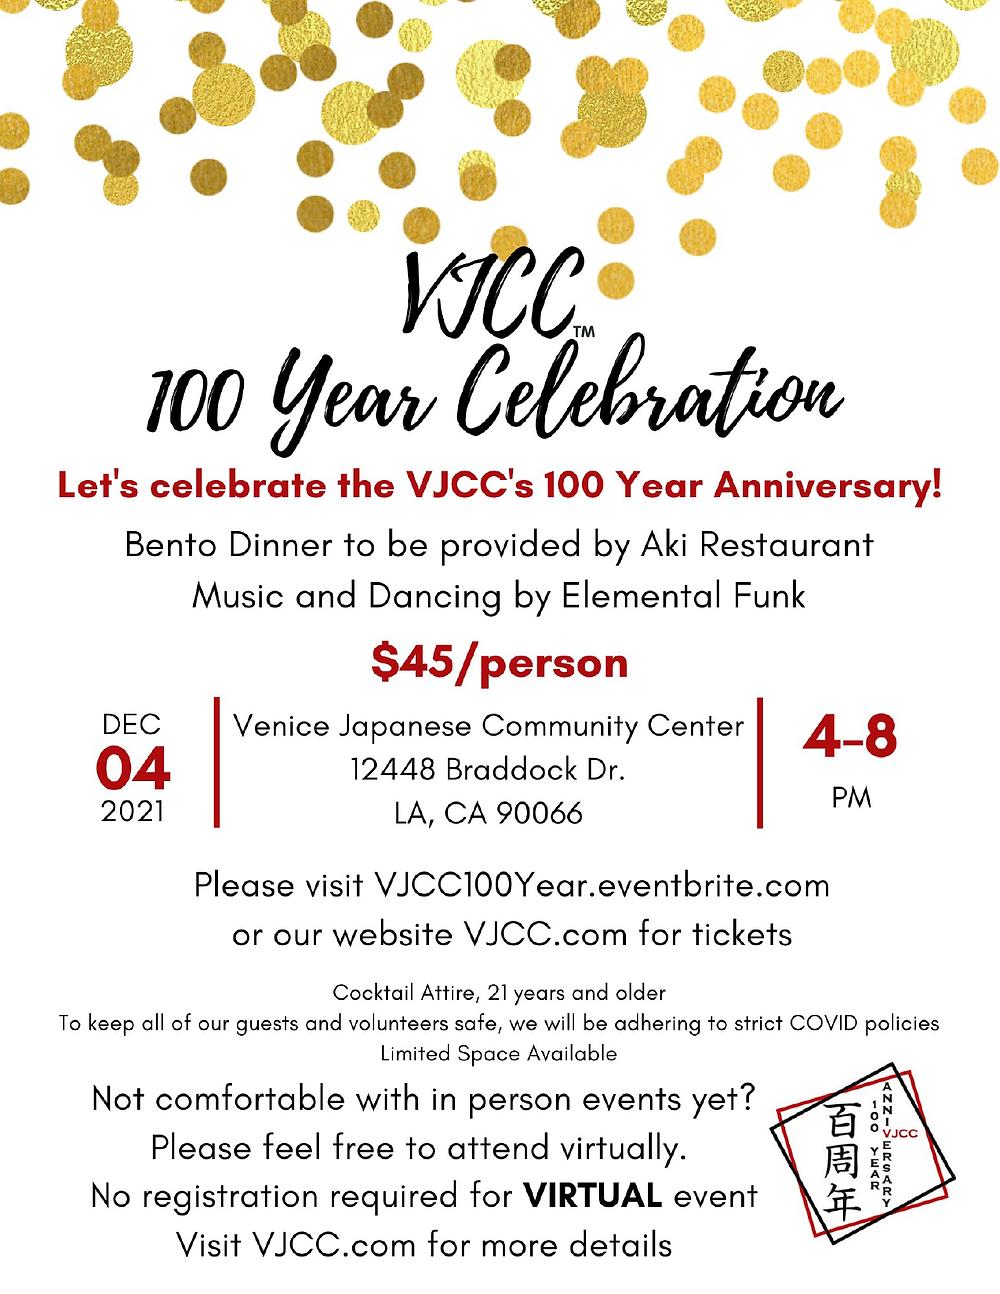 VJCC 100-year Celebration flyer